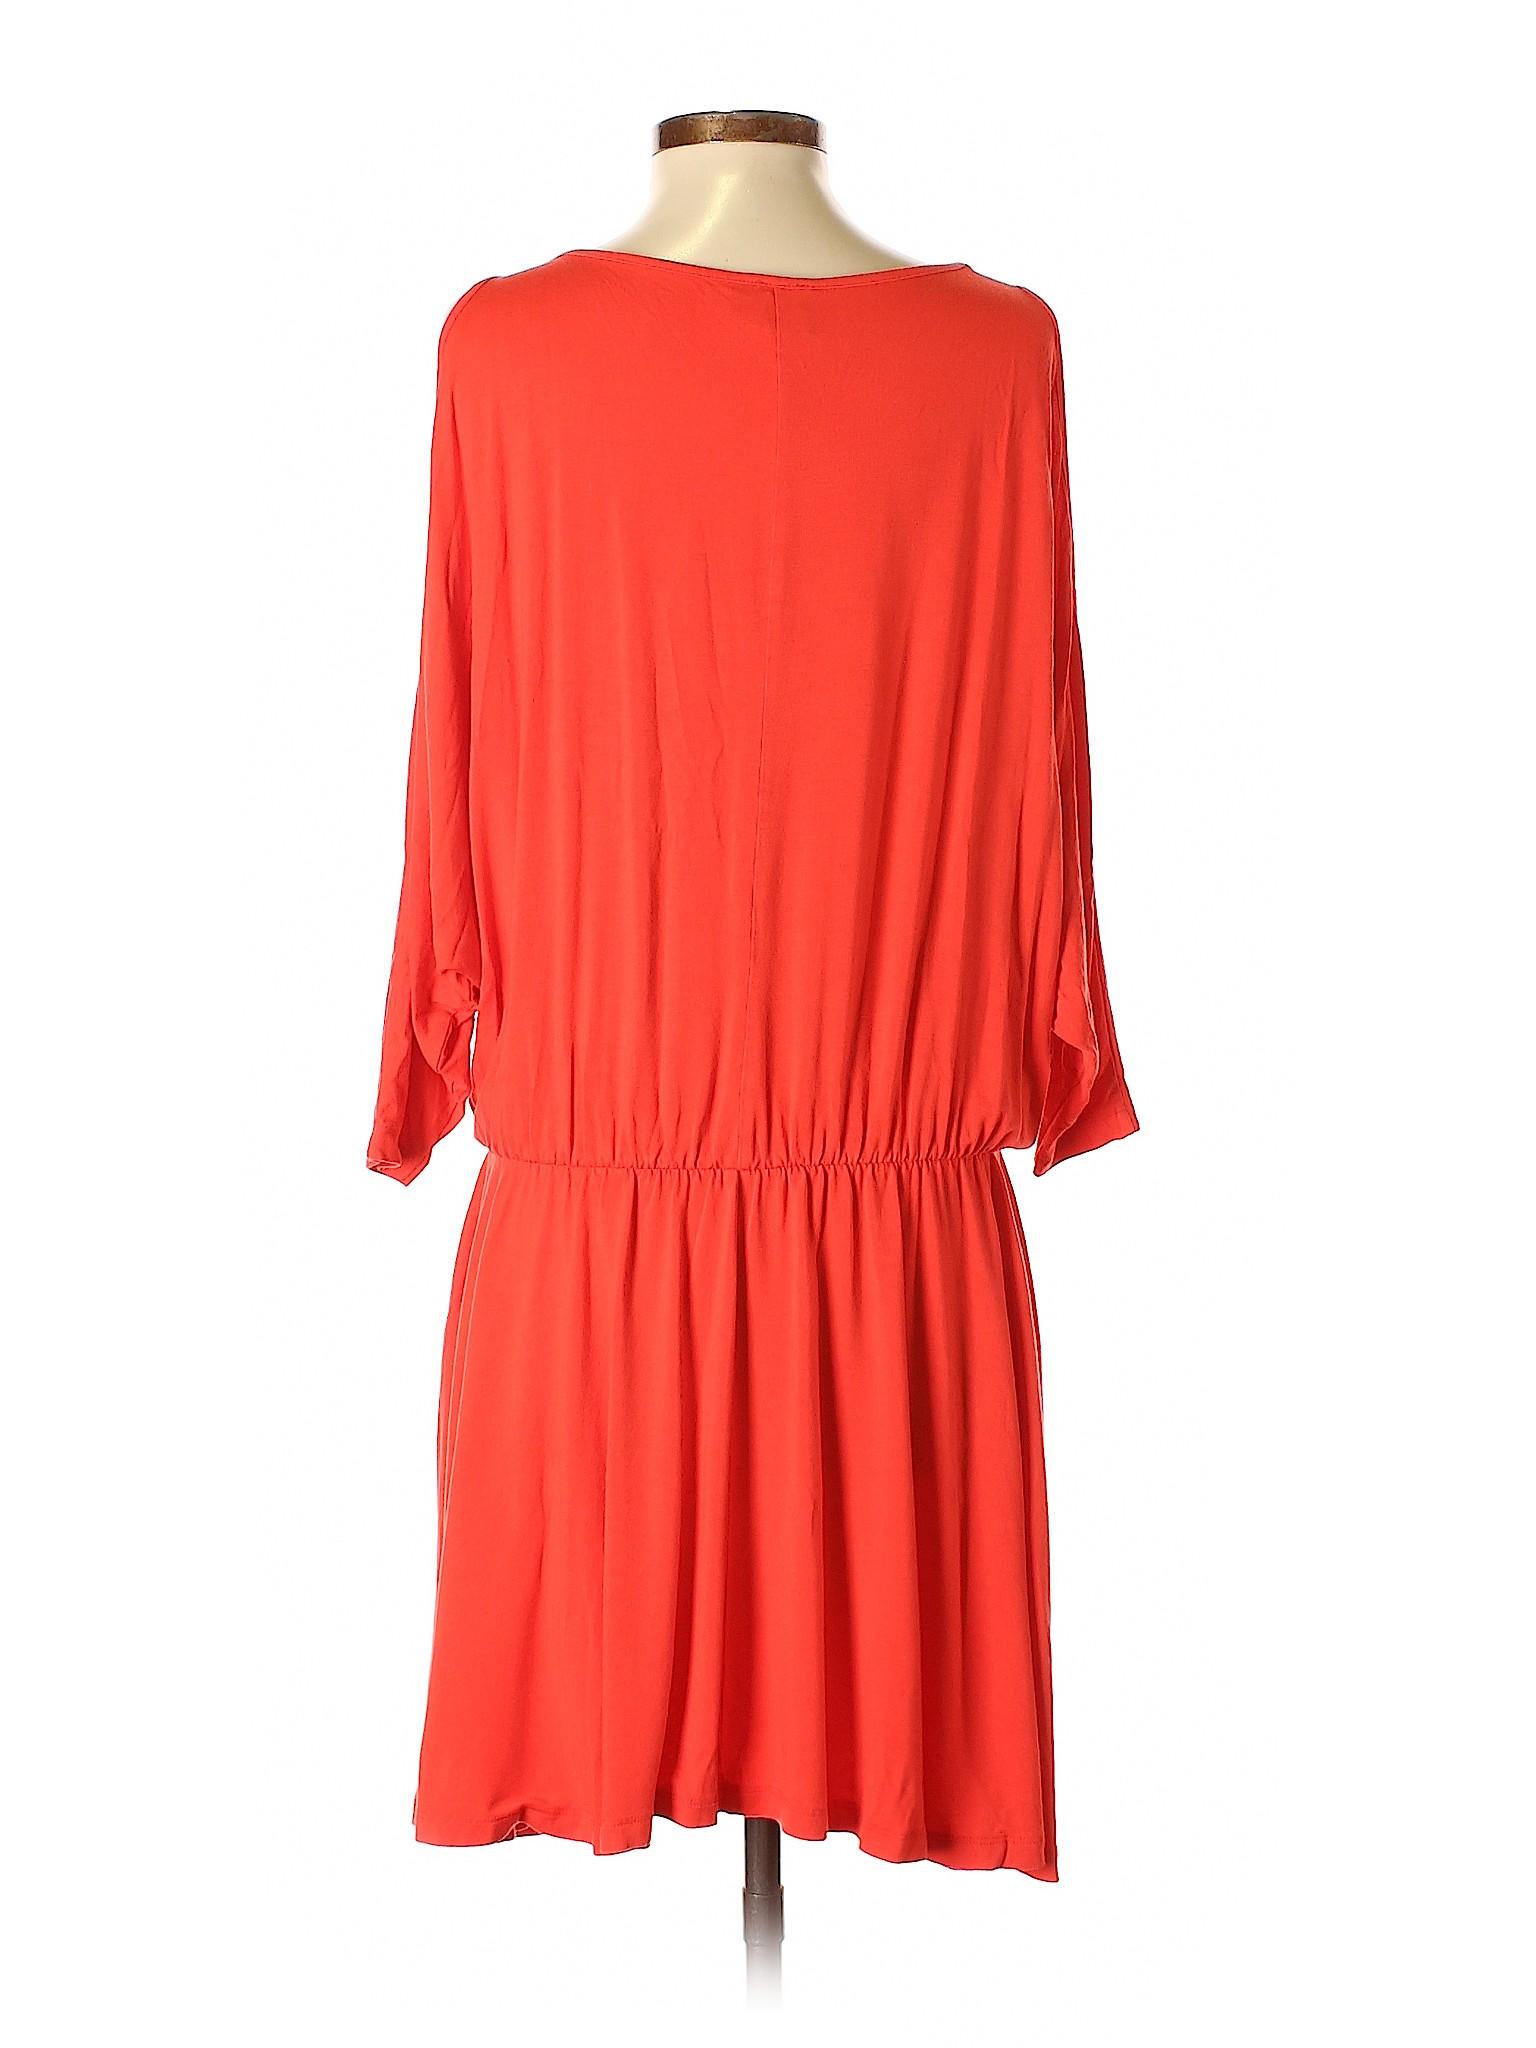 Asos Casual Winter Casual Boutique Boutique Winter Dress Asos Px8U6ppw